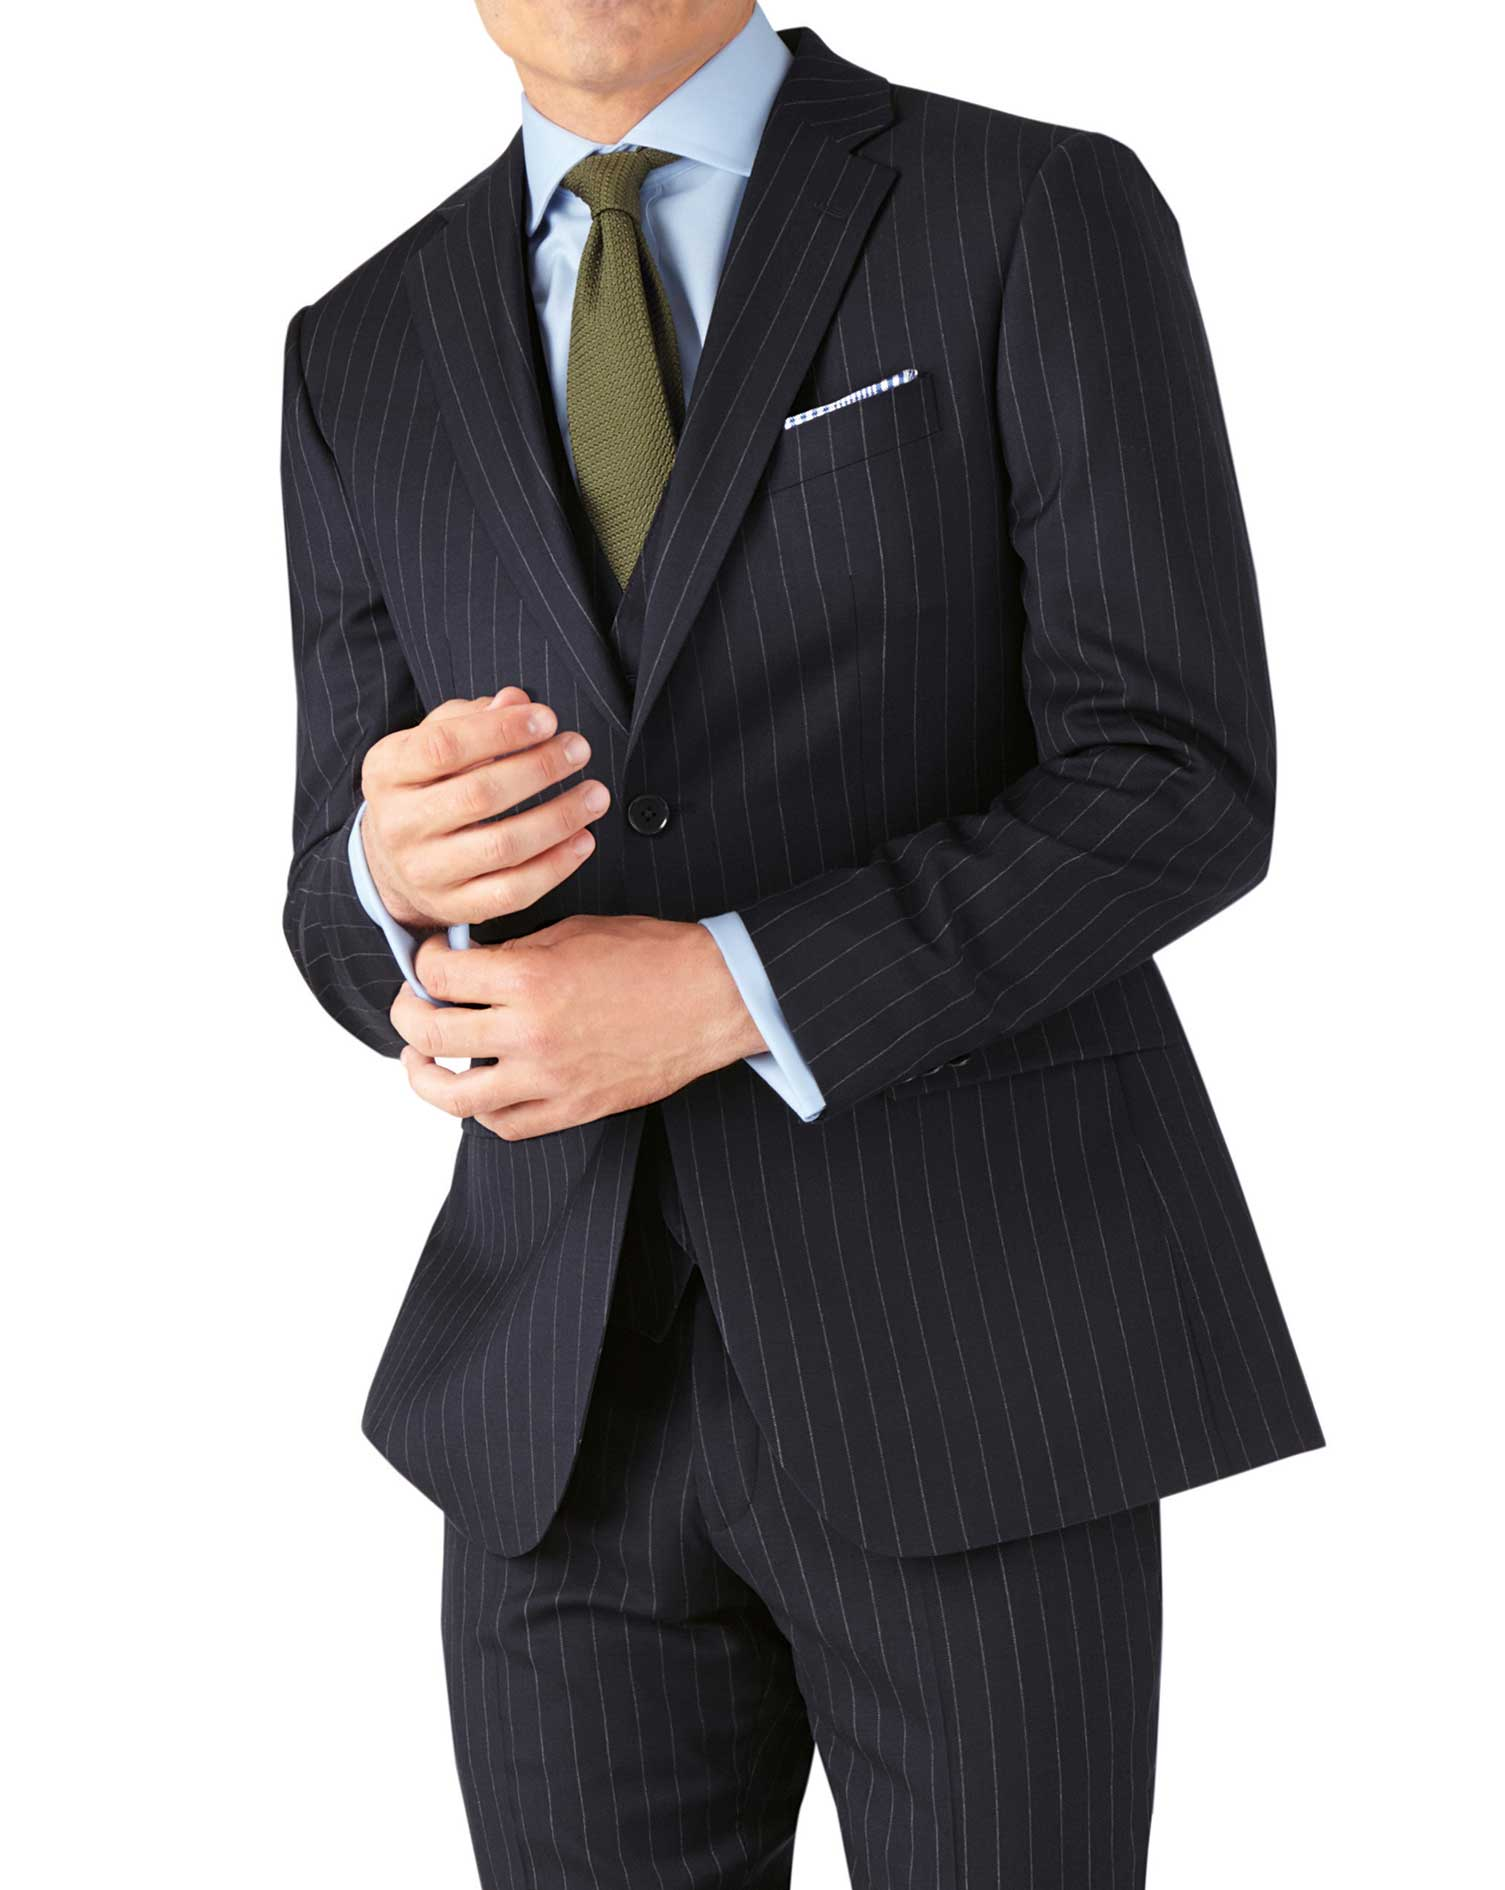 Navy Stripe Slim Fit Twill Business Suit Wool Jacket Size 36 Regular by Charles Tyrwhitt